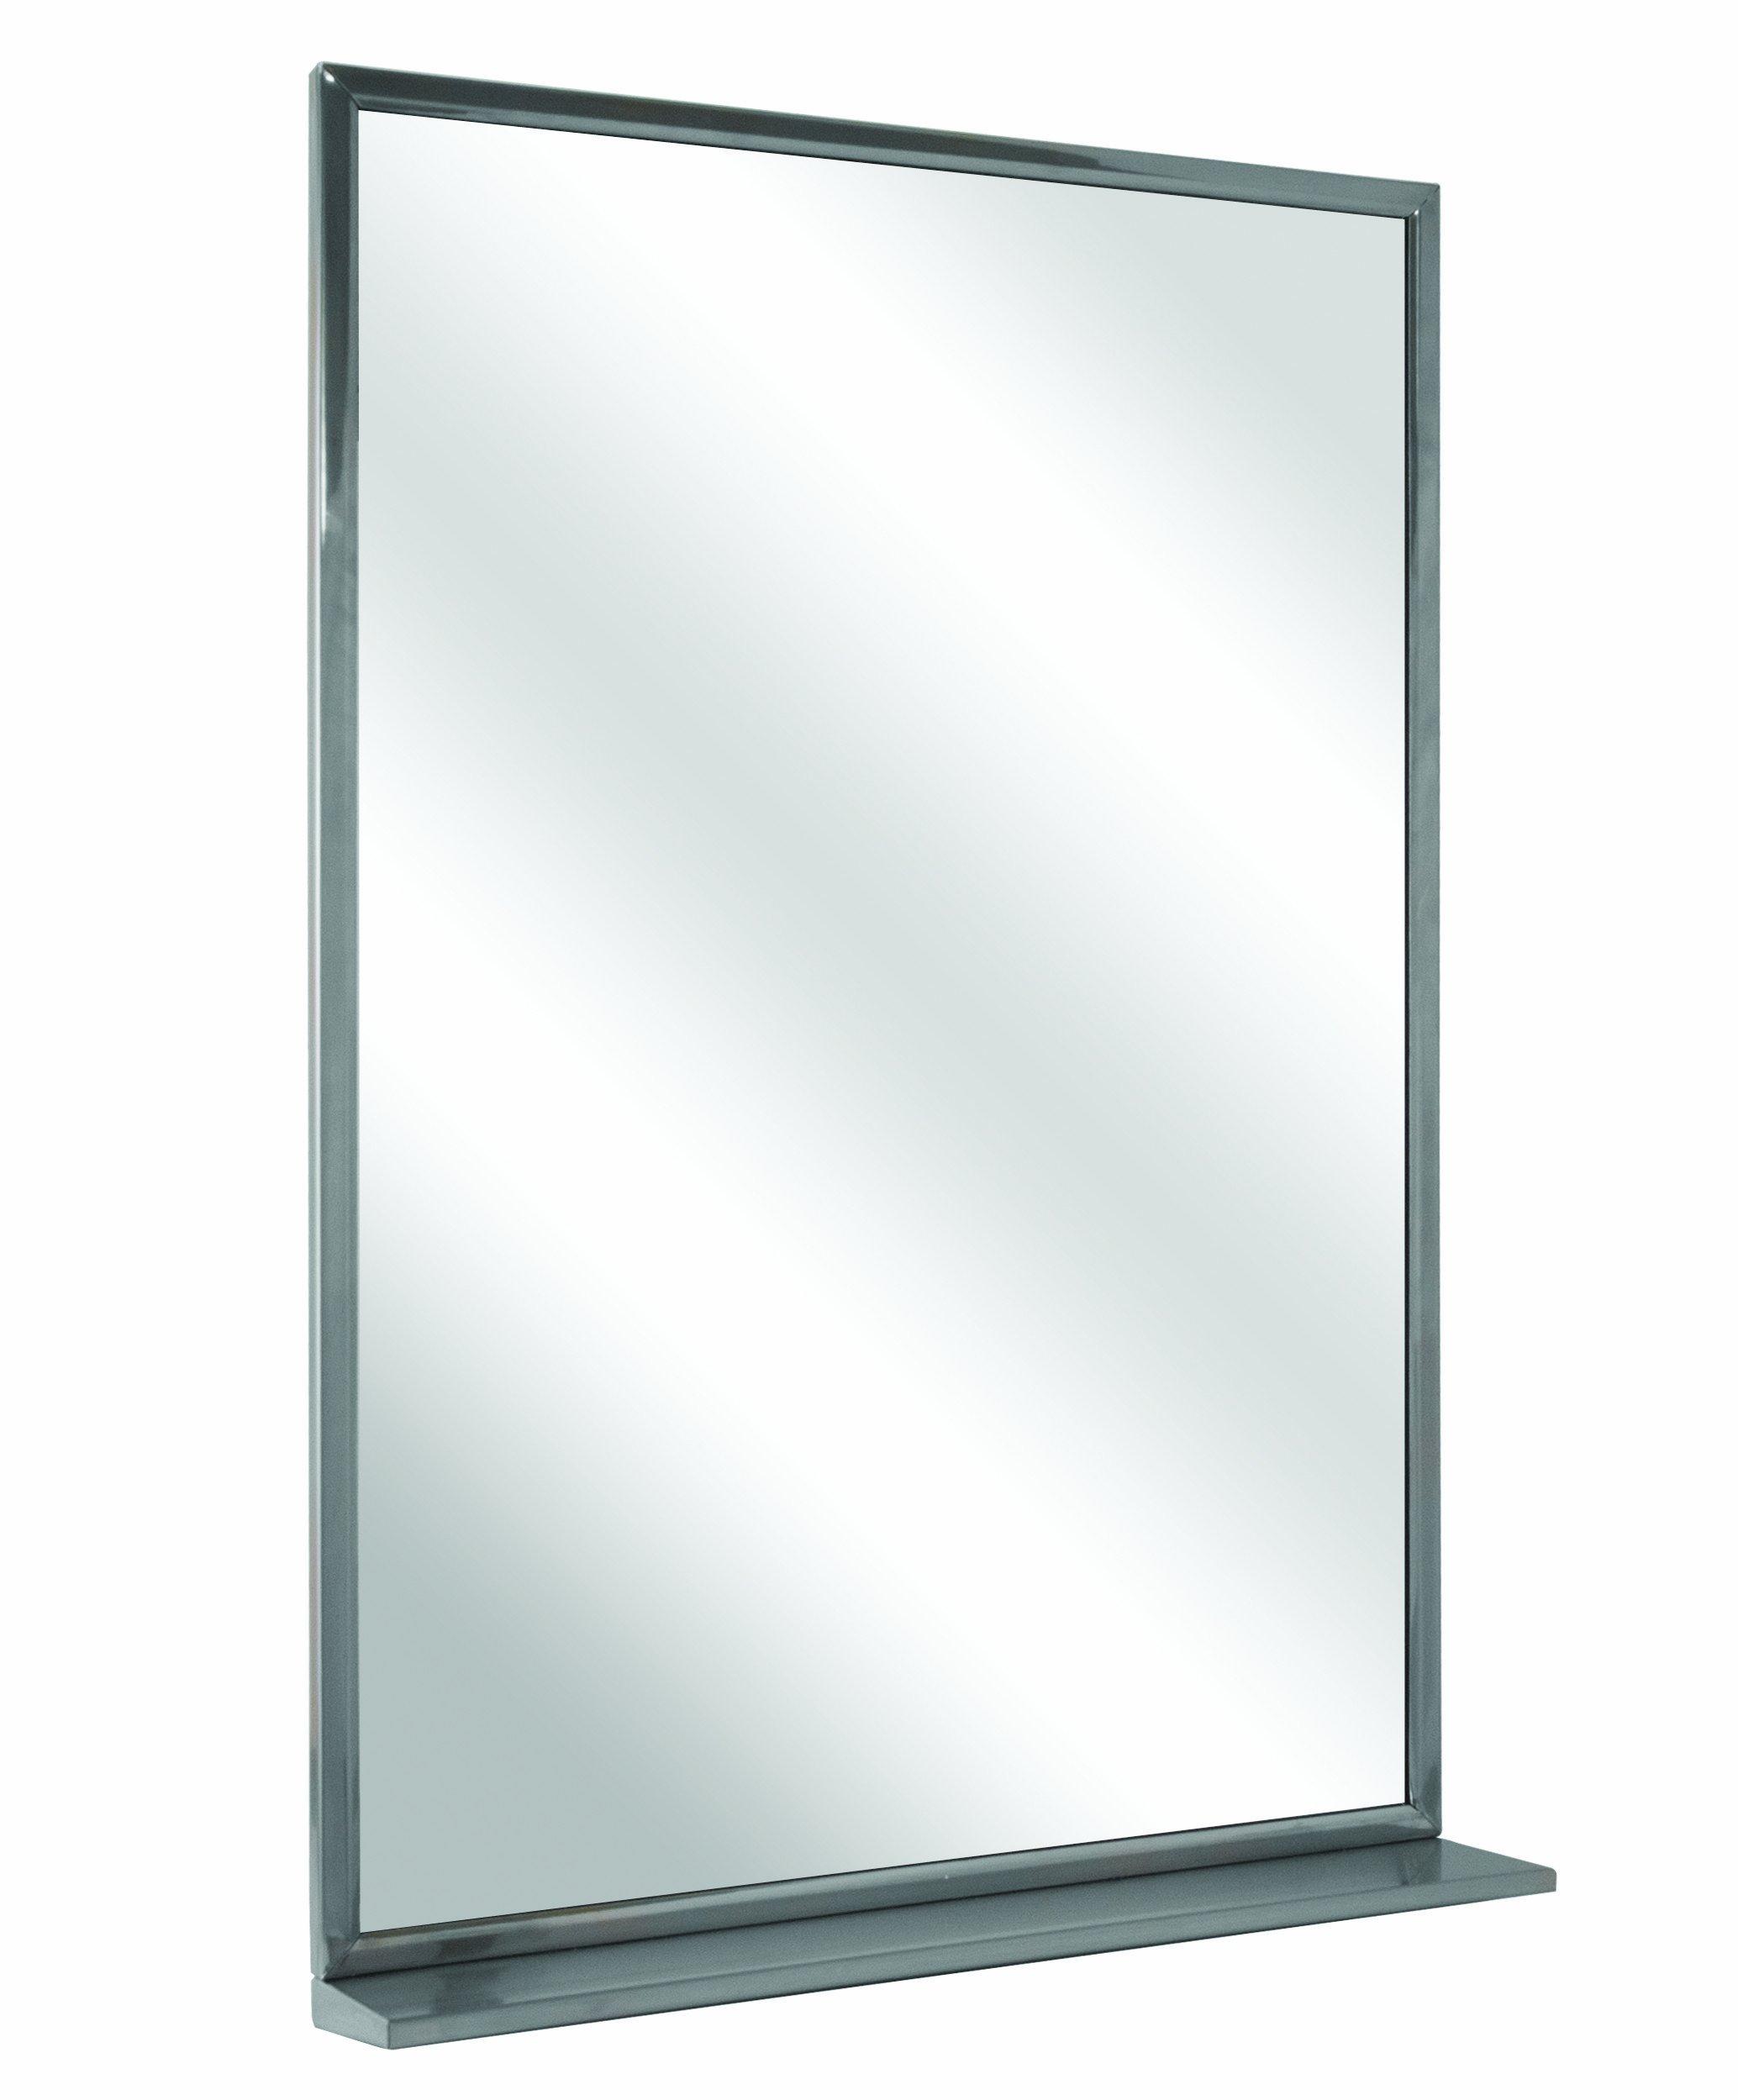 Bradley 7815-024360 Roll-Formed Channel Frame Float Glass Mirror with Shelf, 24'' Width x 36'' Height